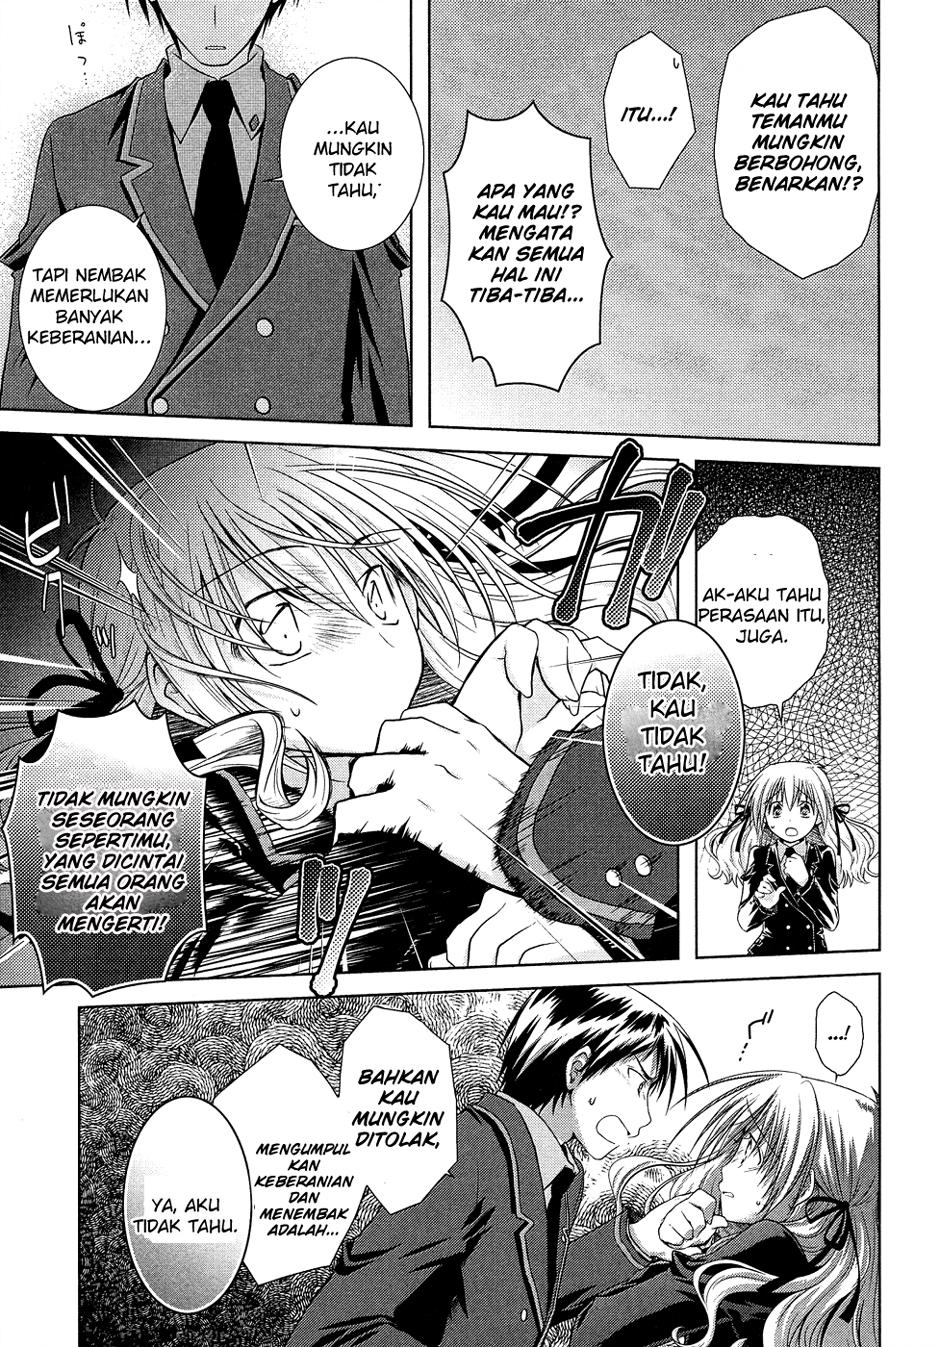 Komik iris zero 011 12 Indonesia iris zero 011 Terbaru 22|Baca Manga Komik Indonesia|